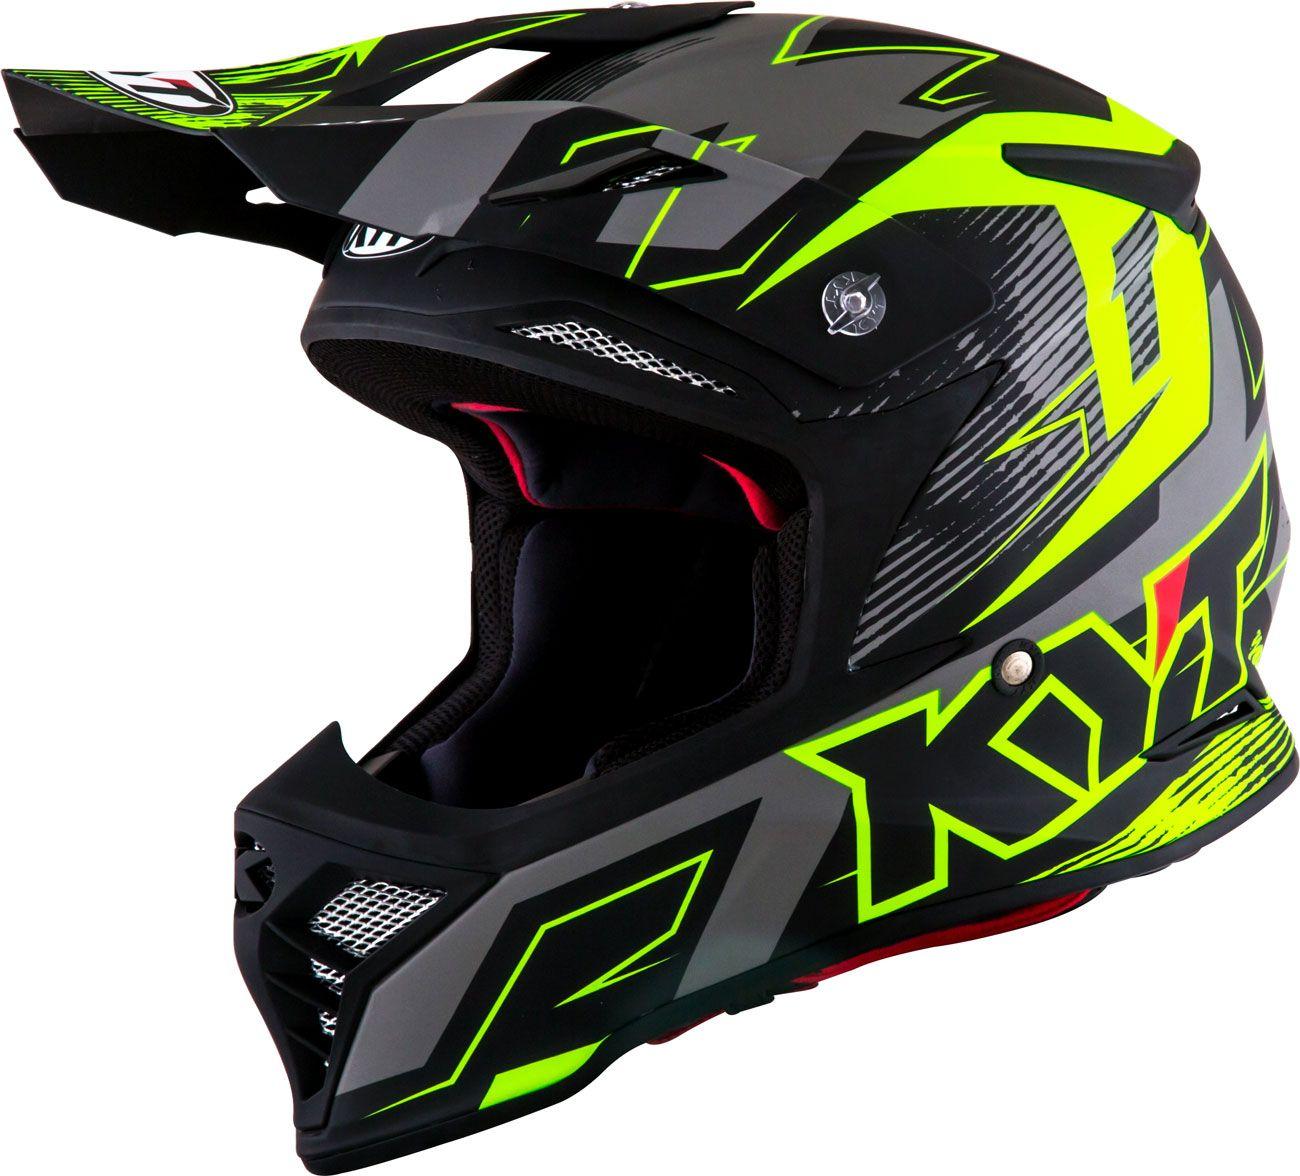 Photo of KYT Skyhawk Digger, Mattschwarzer / Neongelber Crossover-Helm